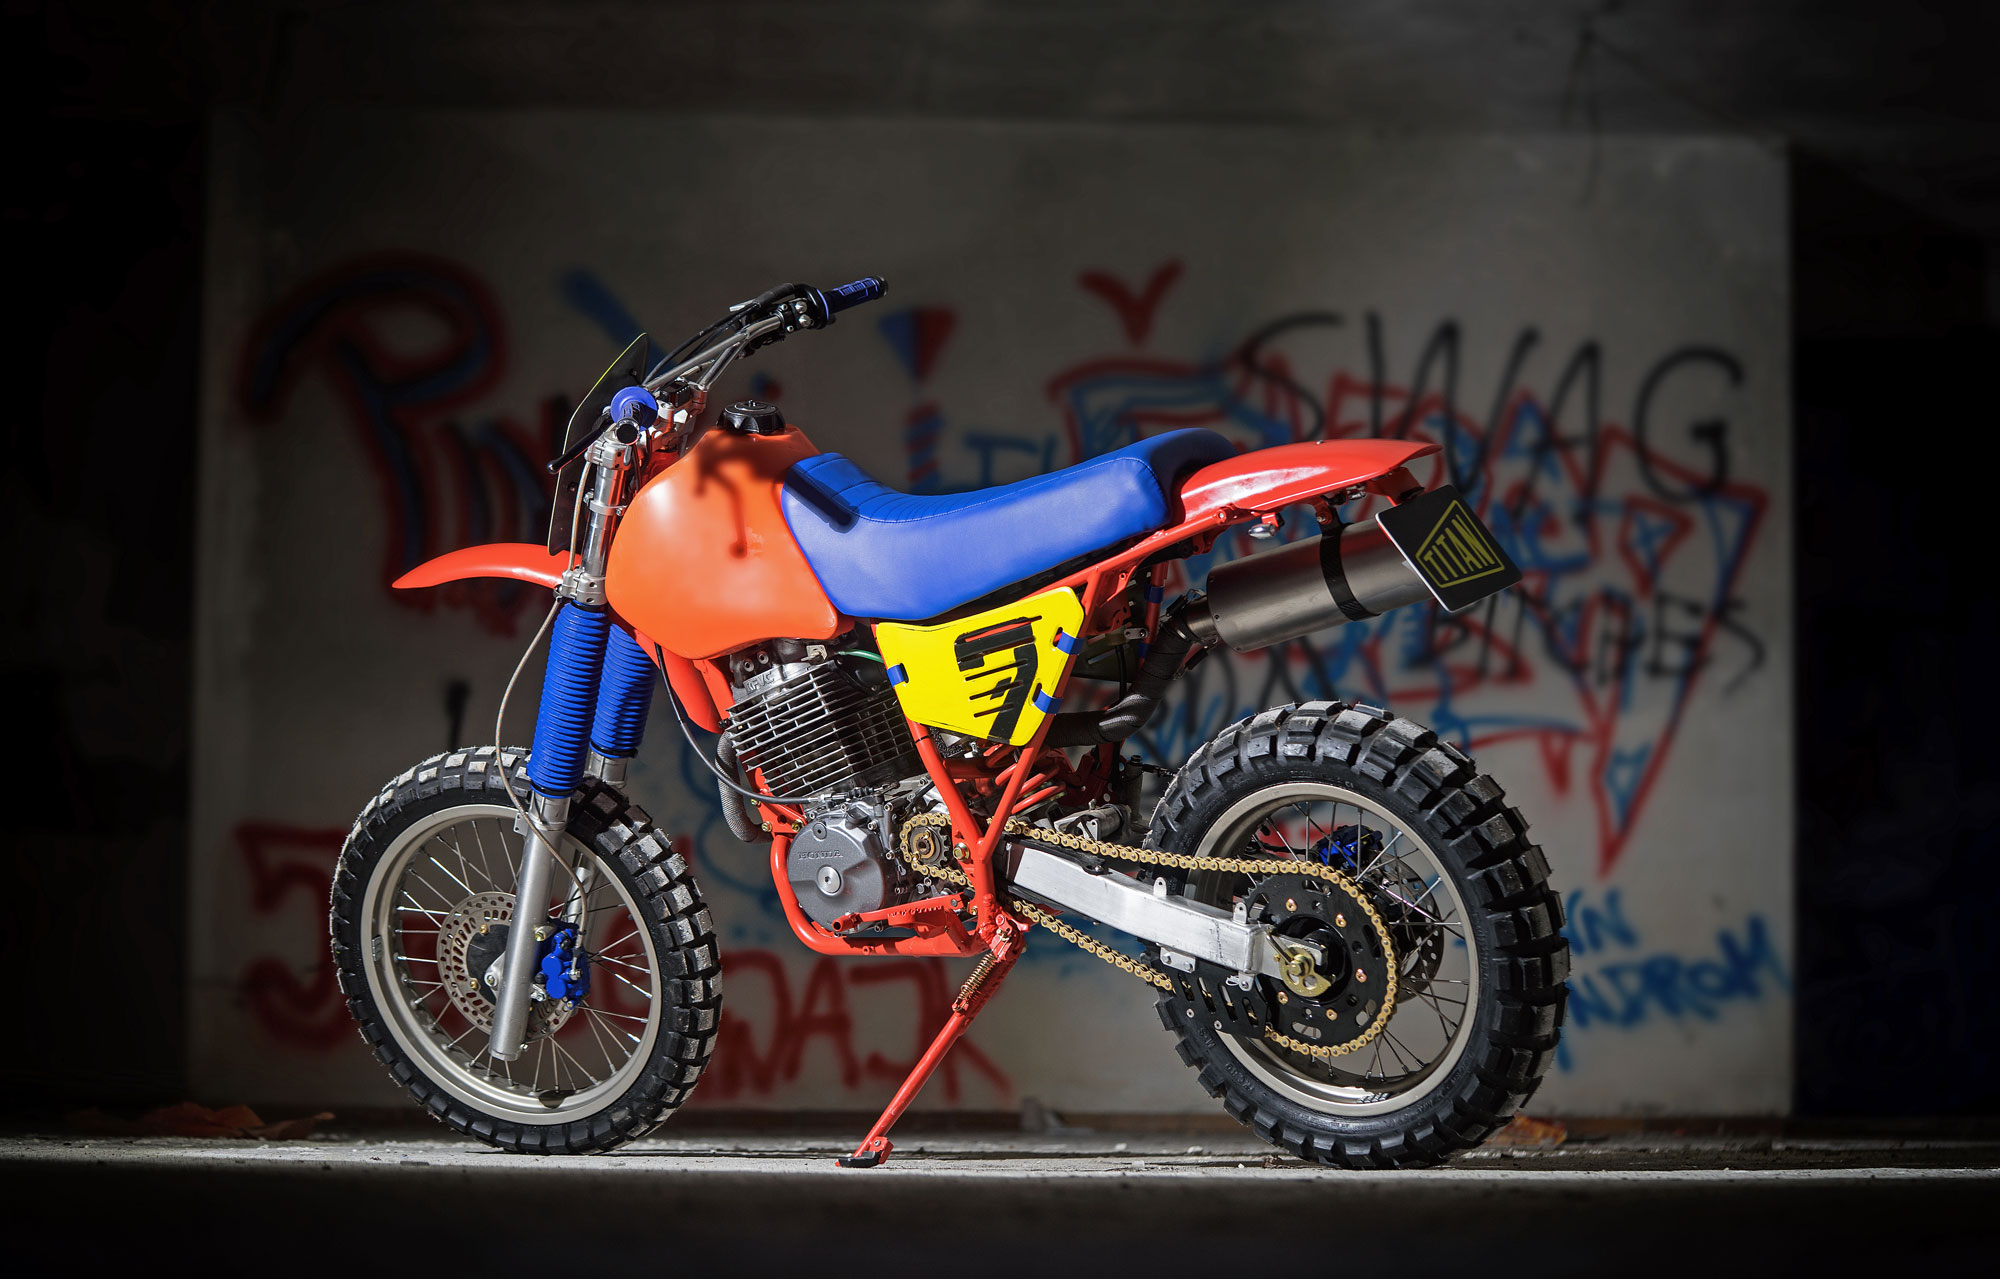 Cafe-Racer-Tracker-Scrambler-Urban-Crosser-Honda-XR600-Titan-Motorcycle-Co-Austria-Typisiert-Graz-Custom-Bikes-made-in-Styria-Austria-(3b)